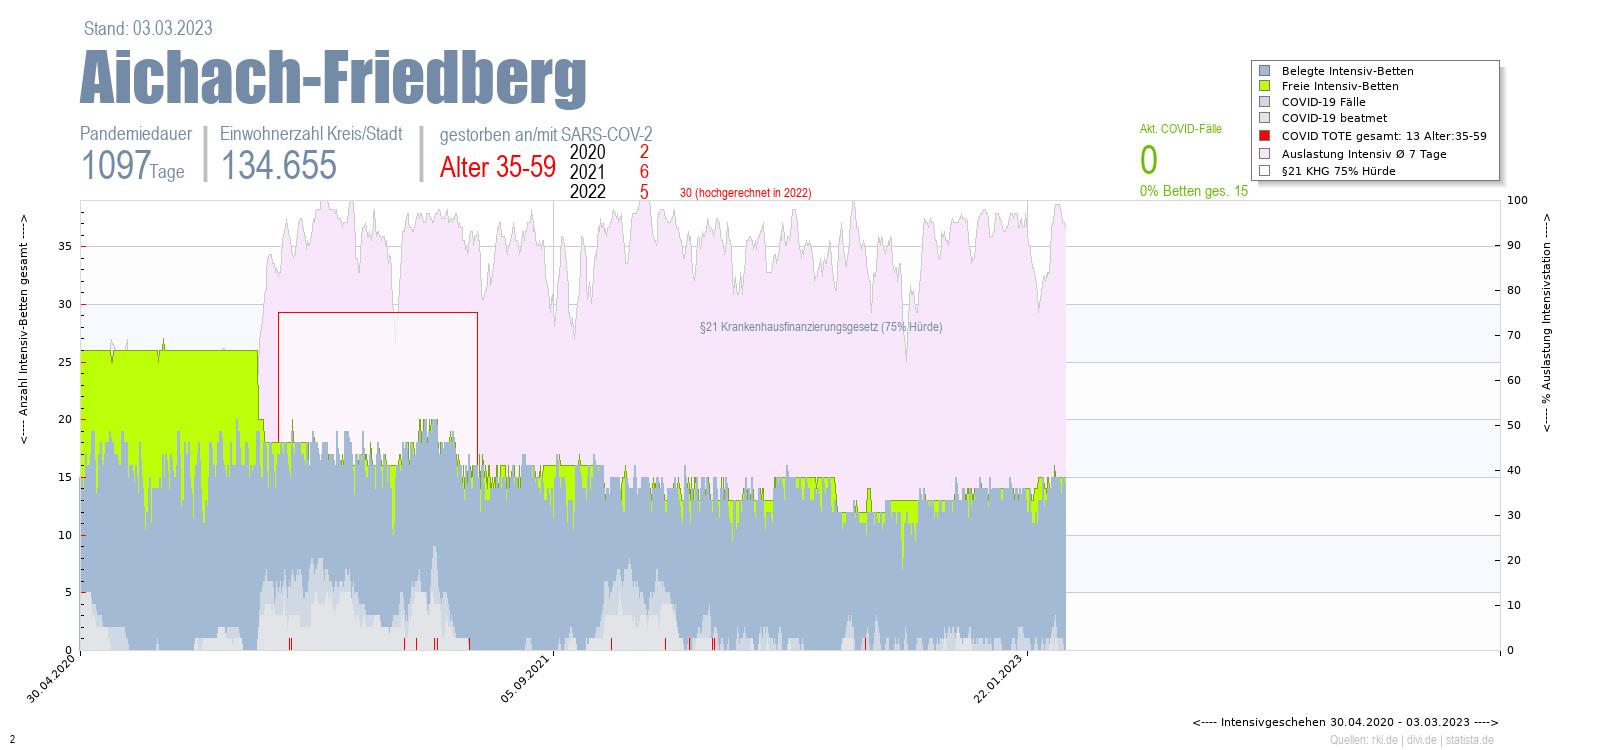 Intensivstation Auslastung Aichach-Friedberg Alter 0-4